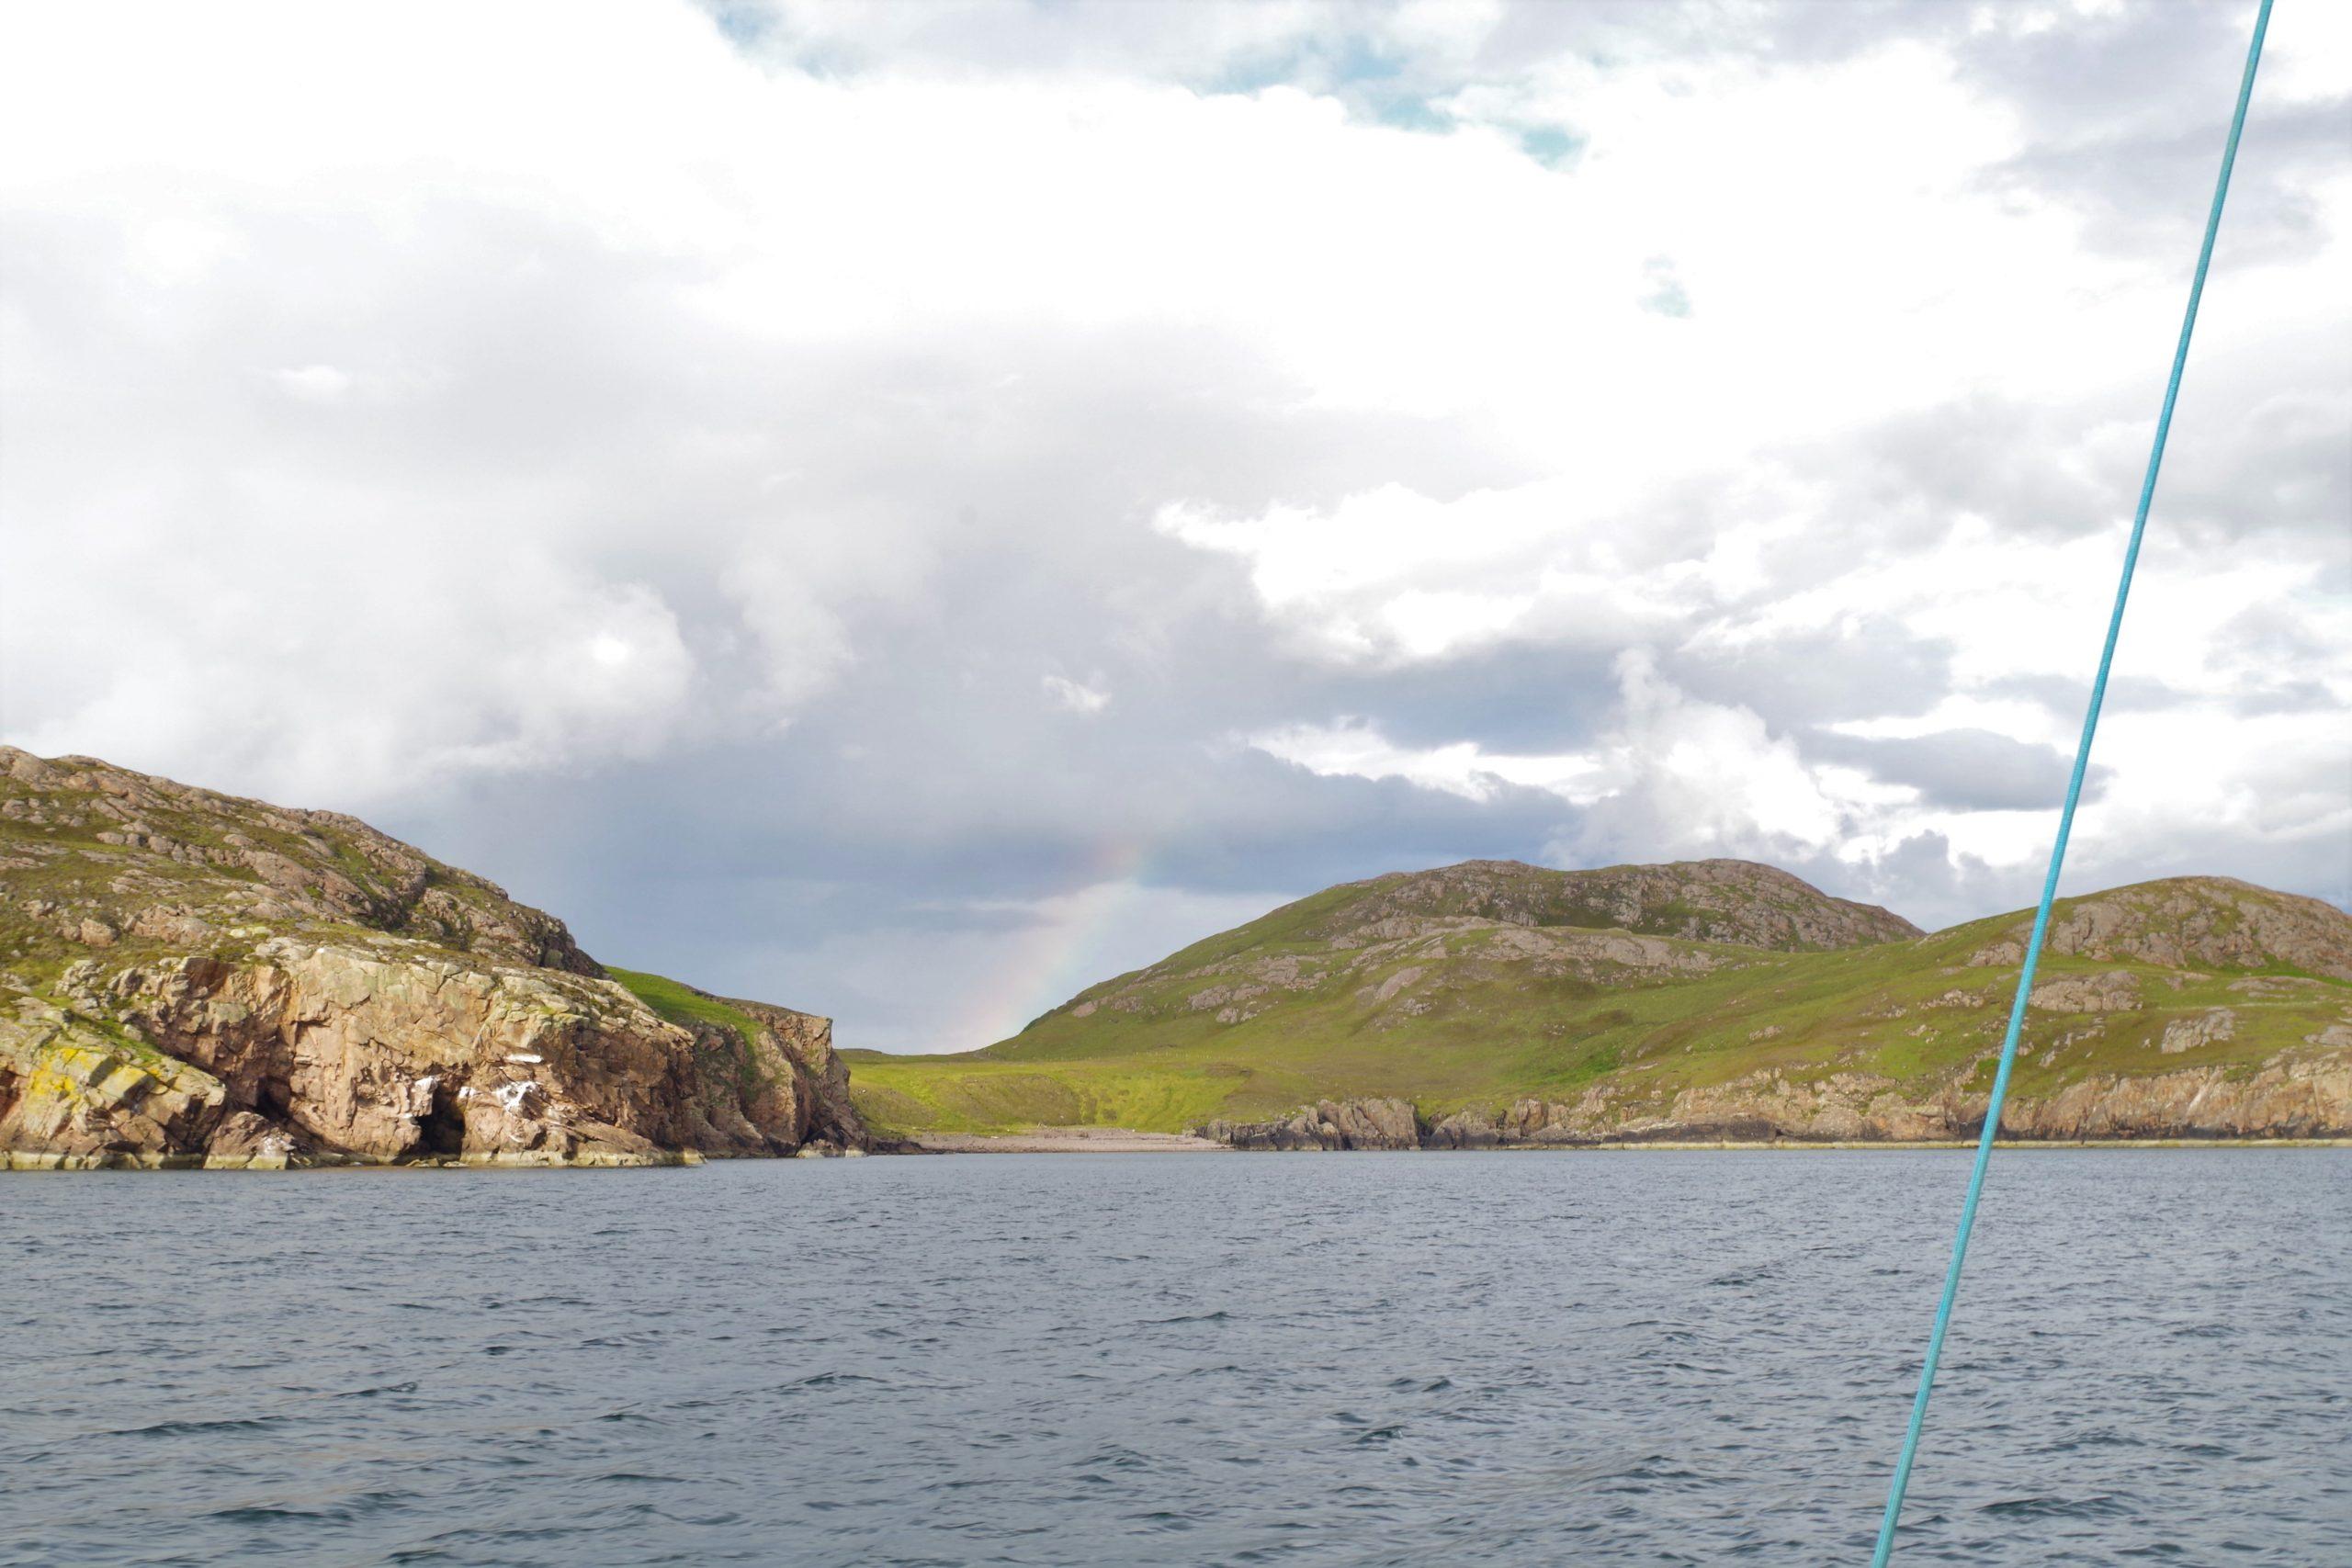 Approaching bay on Tanera Mor